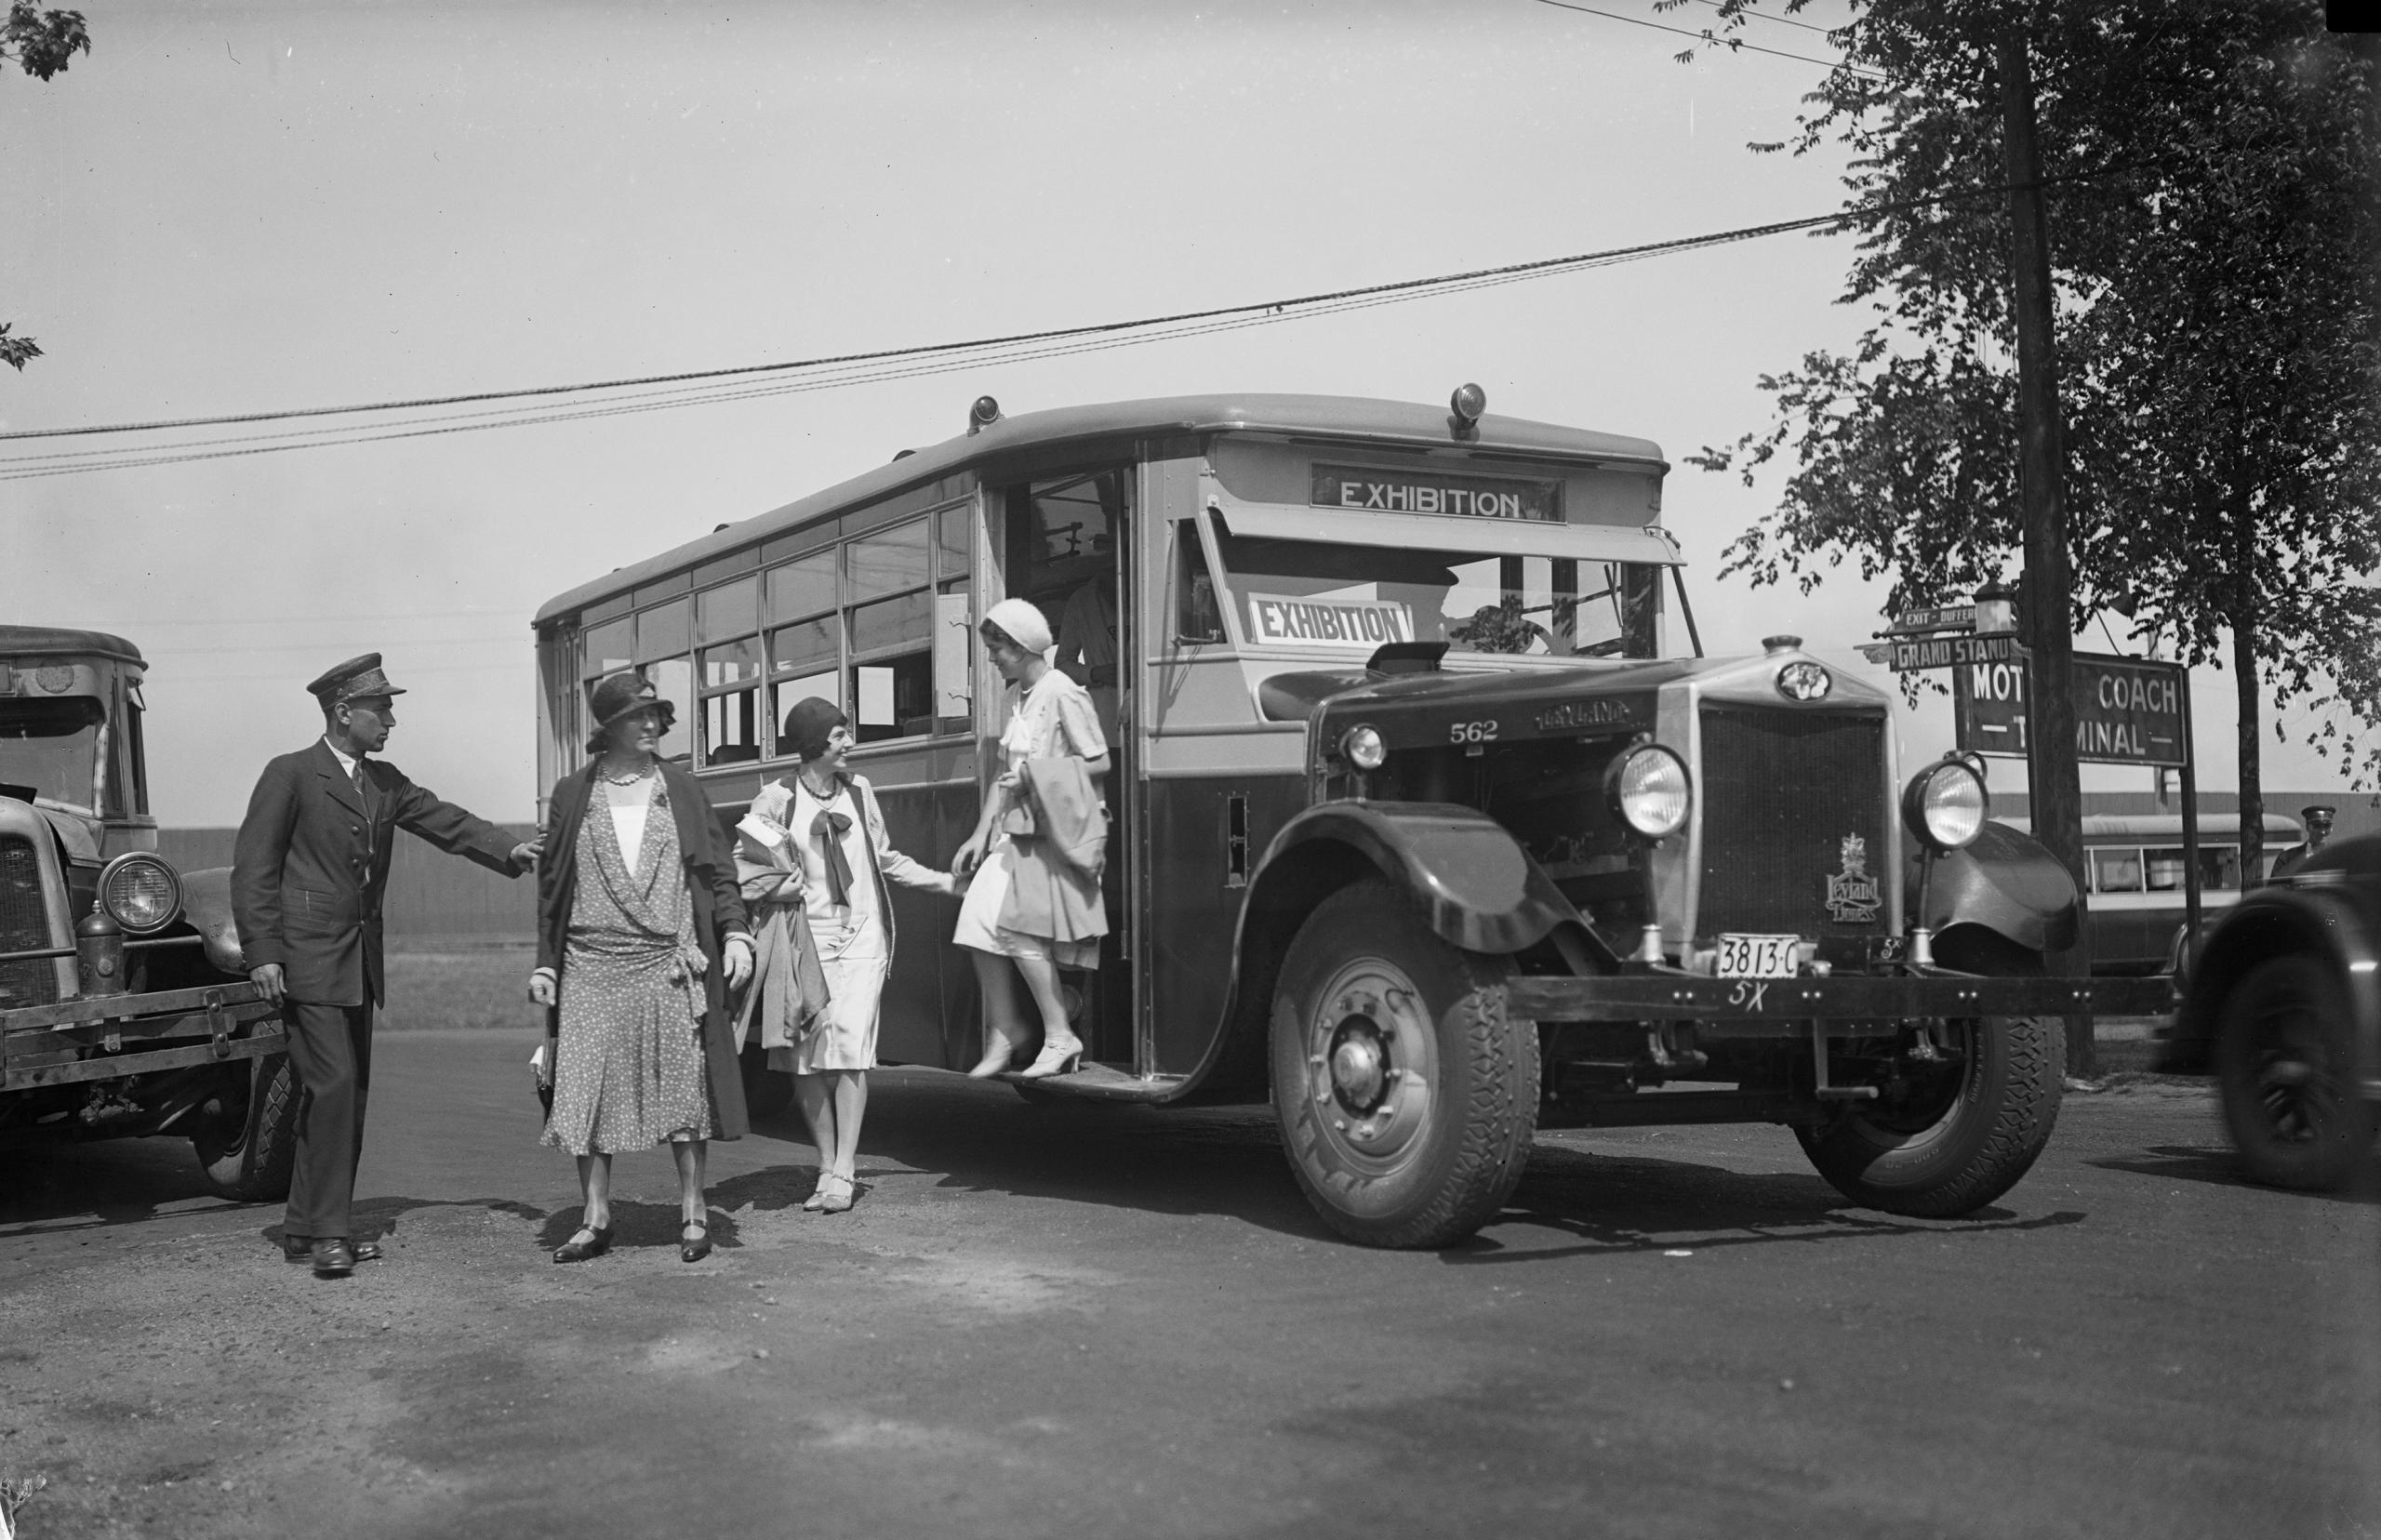 TTC Archives, CNE Motorcoach, 1930